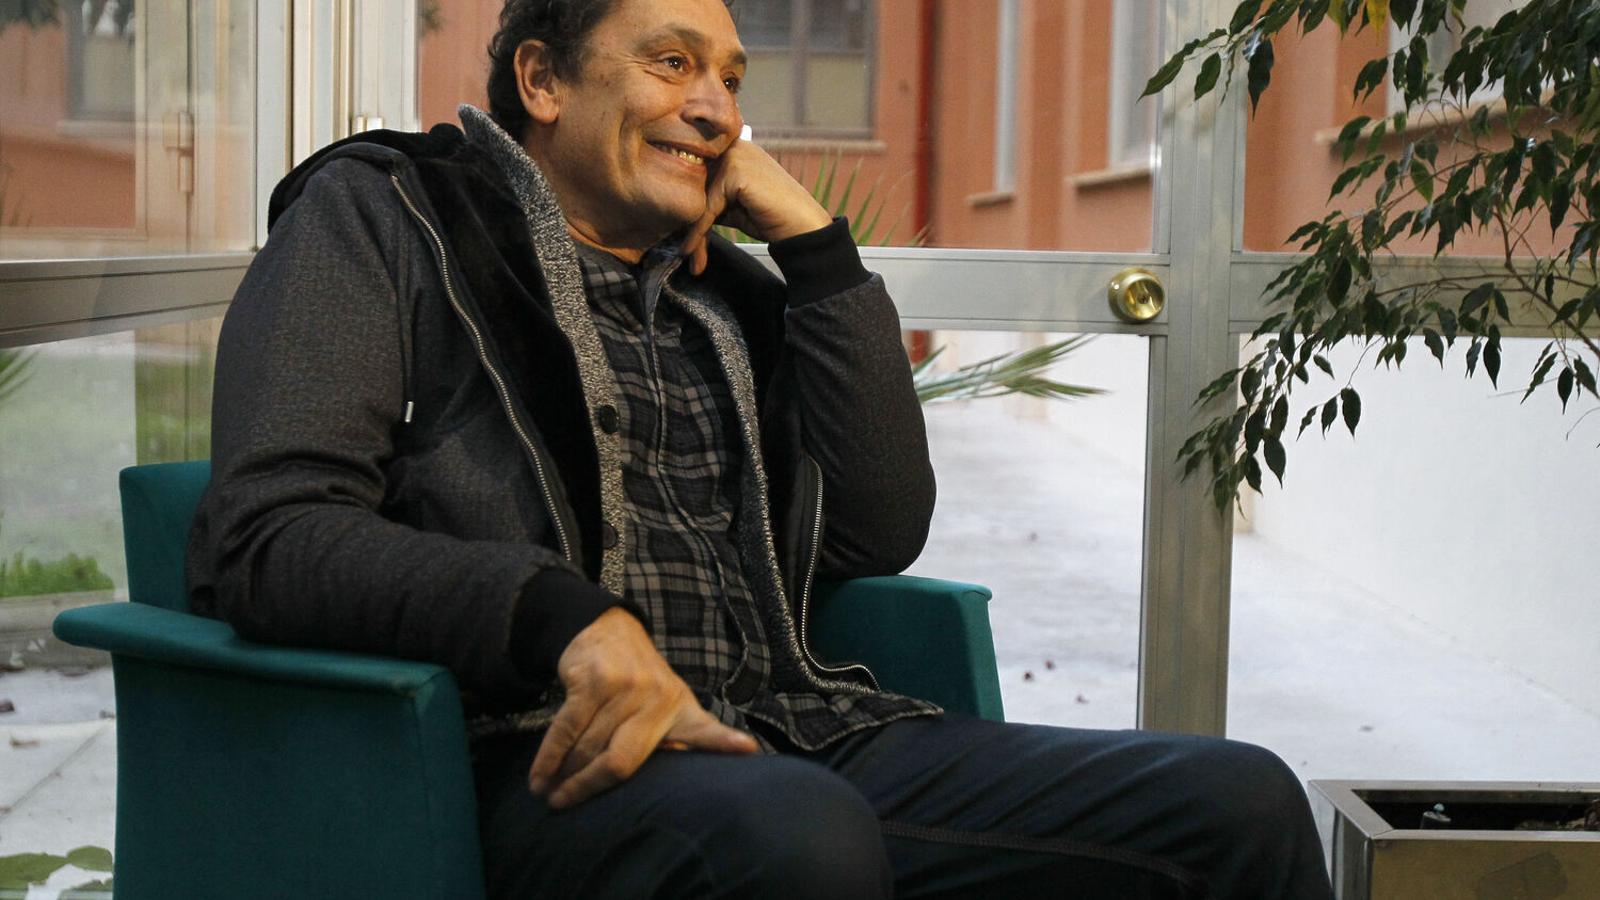 El cineasta Agustí Villaronga